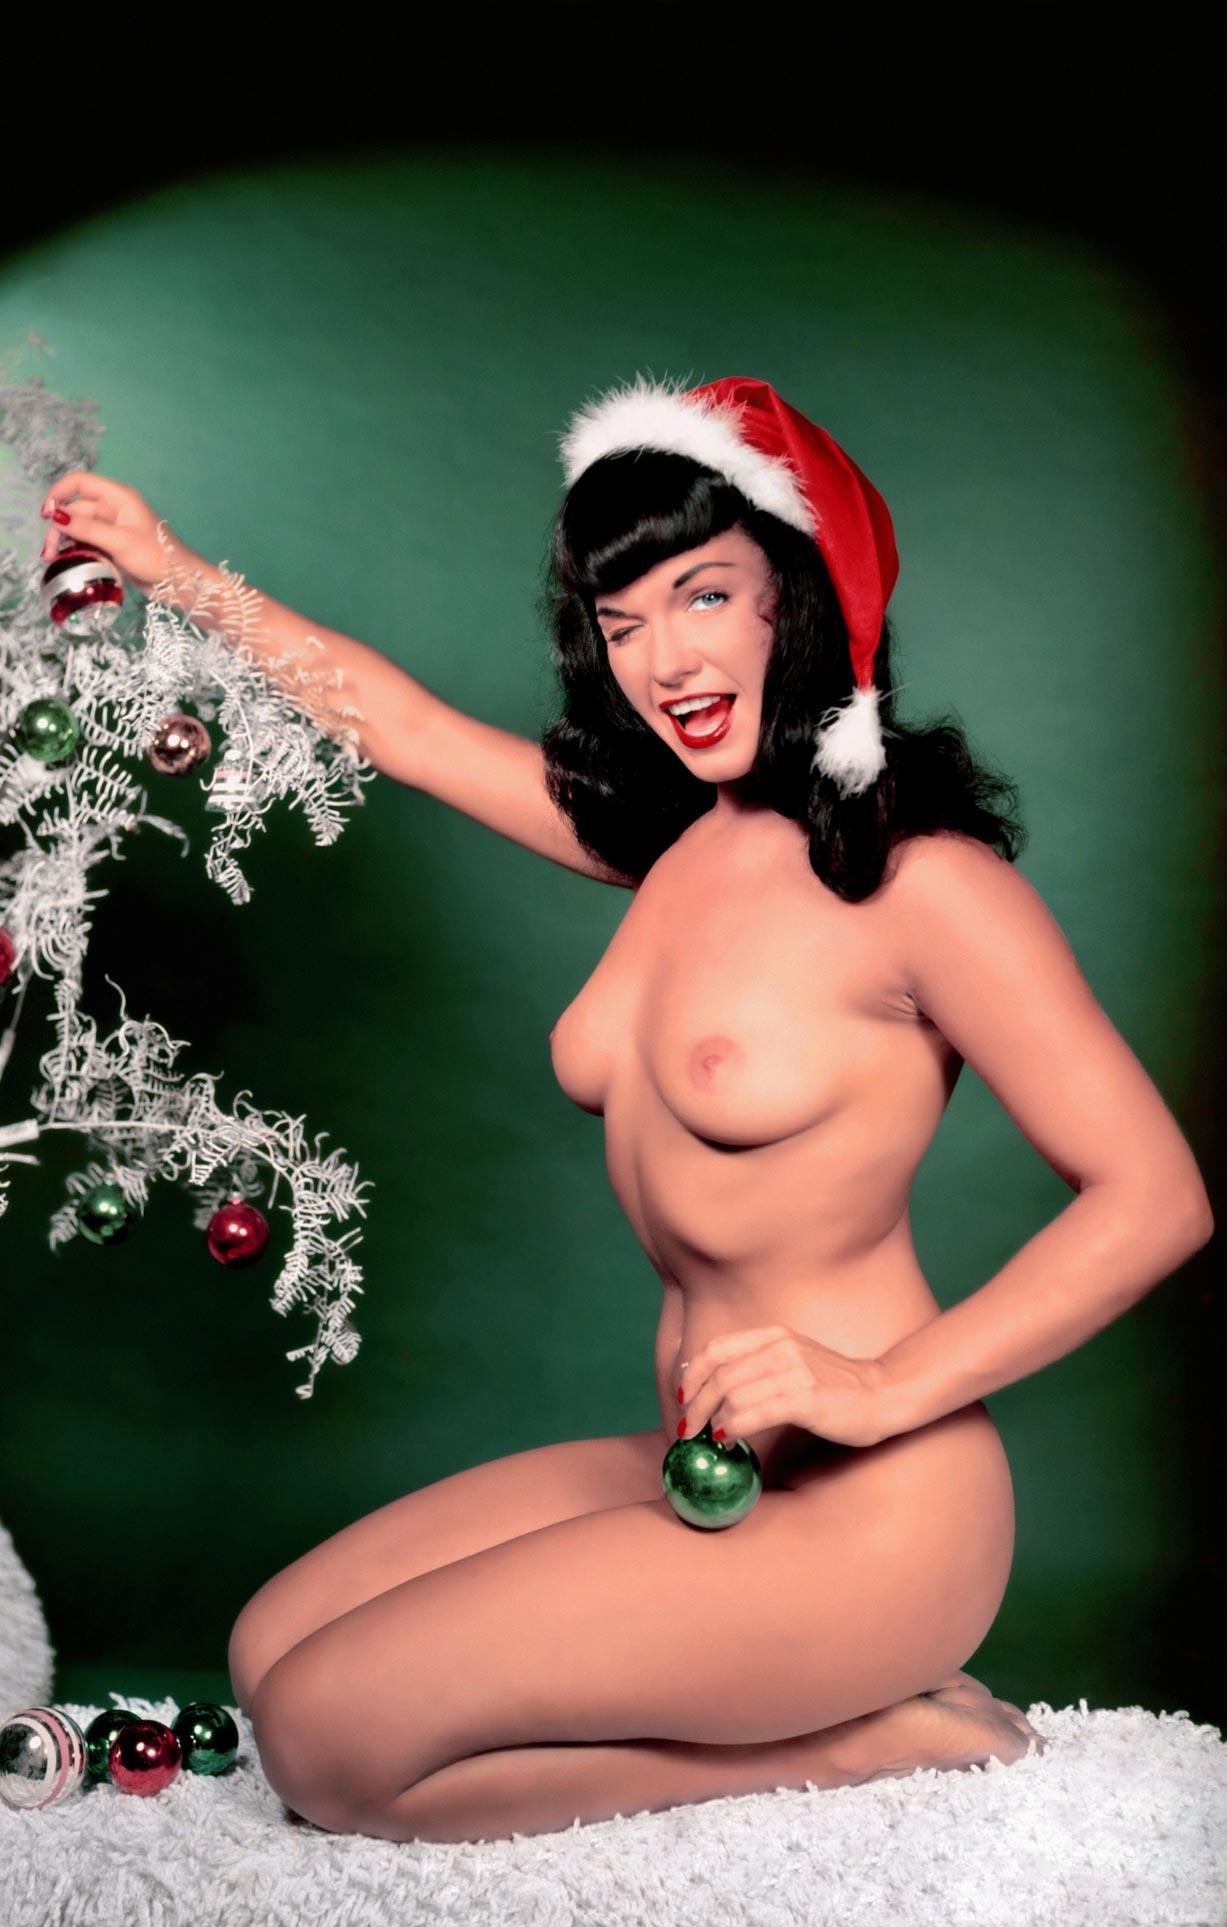 Playboy Playmate - Miss January 1955 | Bettie Page / Бетти Пейдж